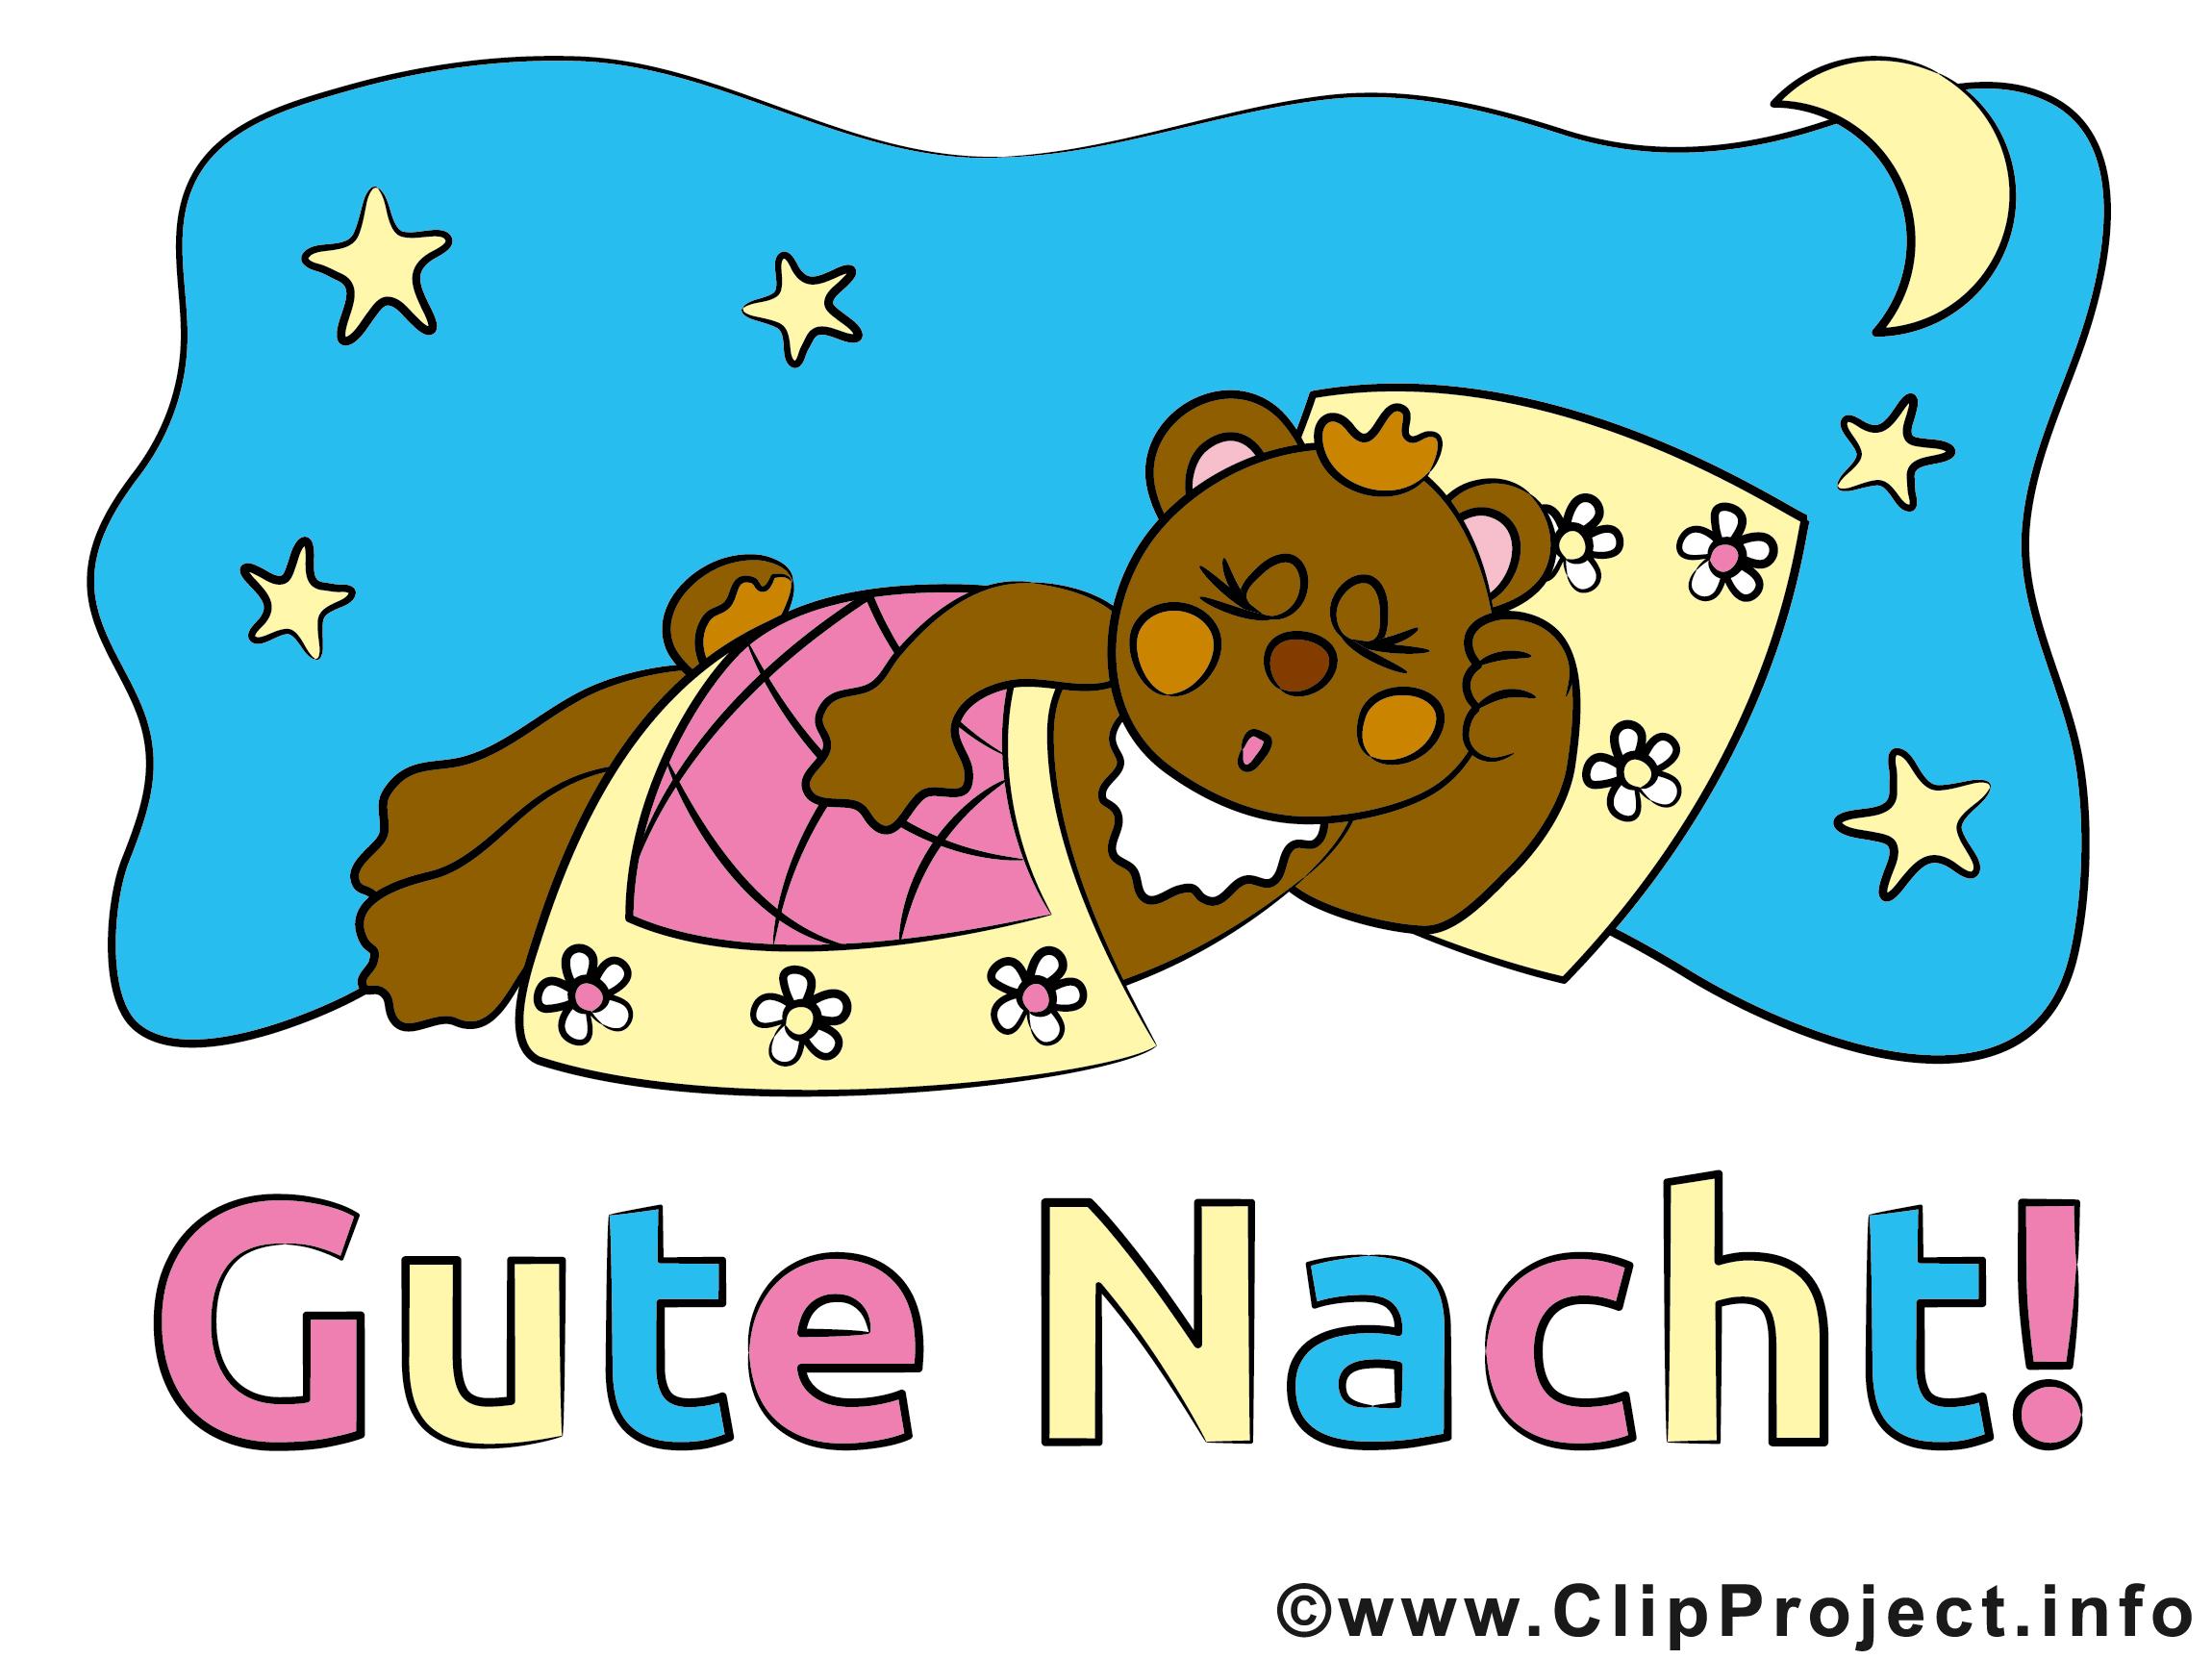 Clipart gute nacht picture transparent download Ein kleiner Bär sagt Gute Nacht picture transparent download